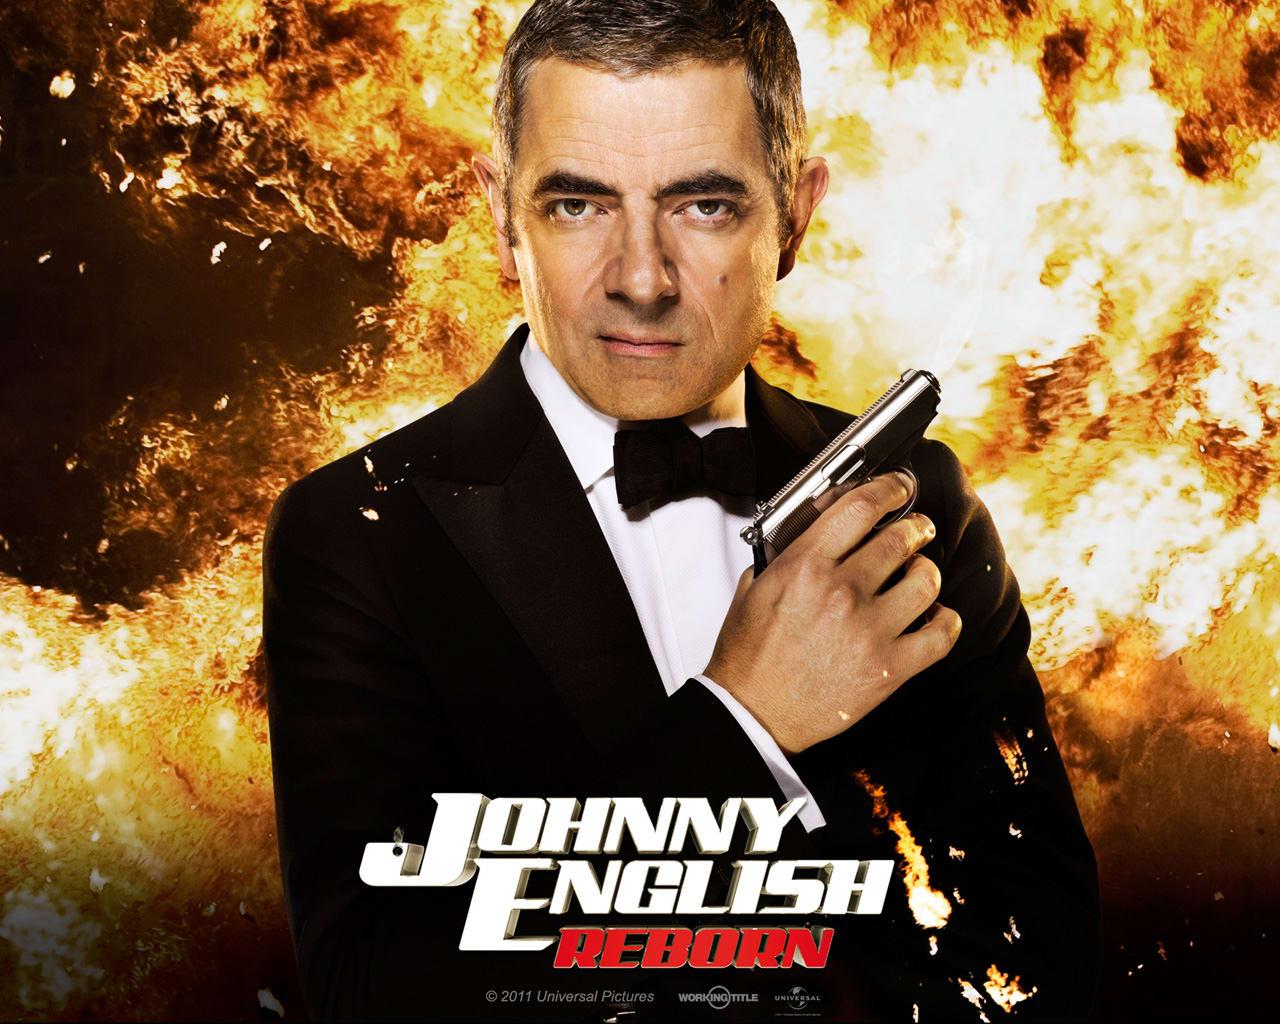 Johnny English Returns Wallpaper